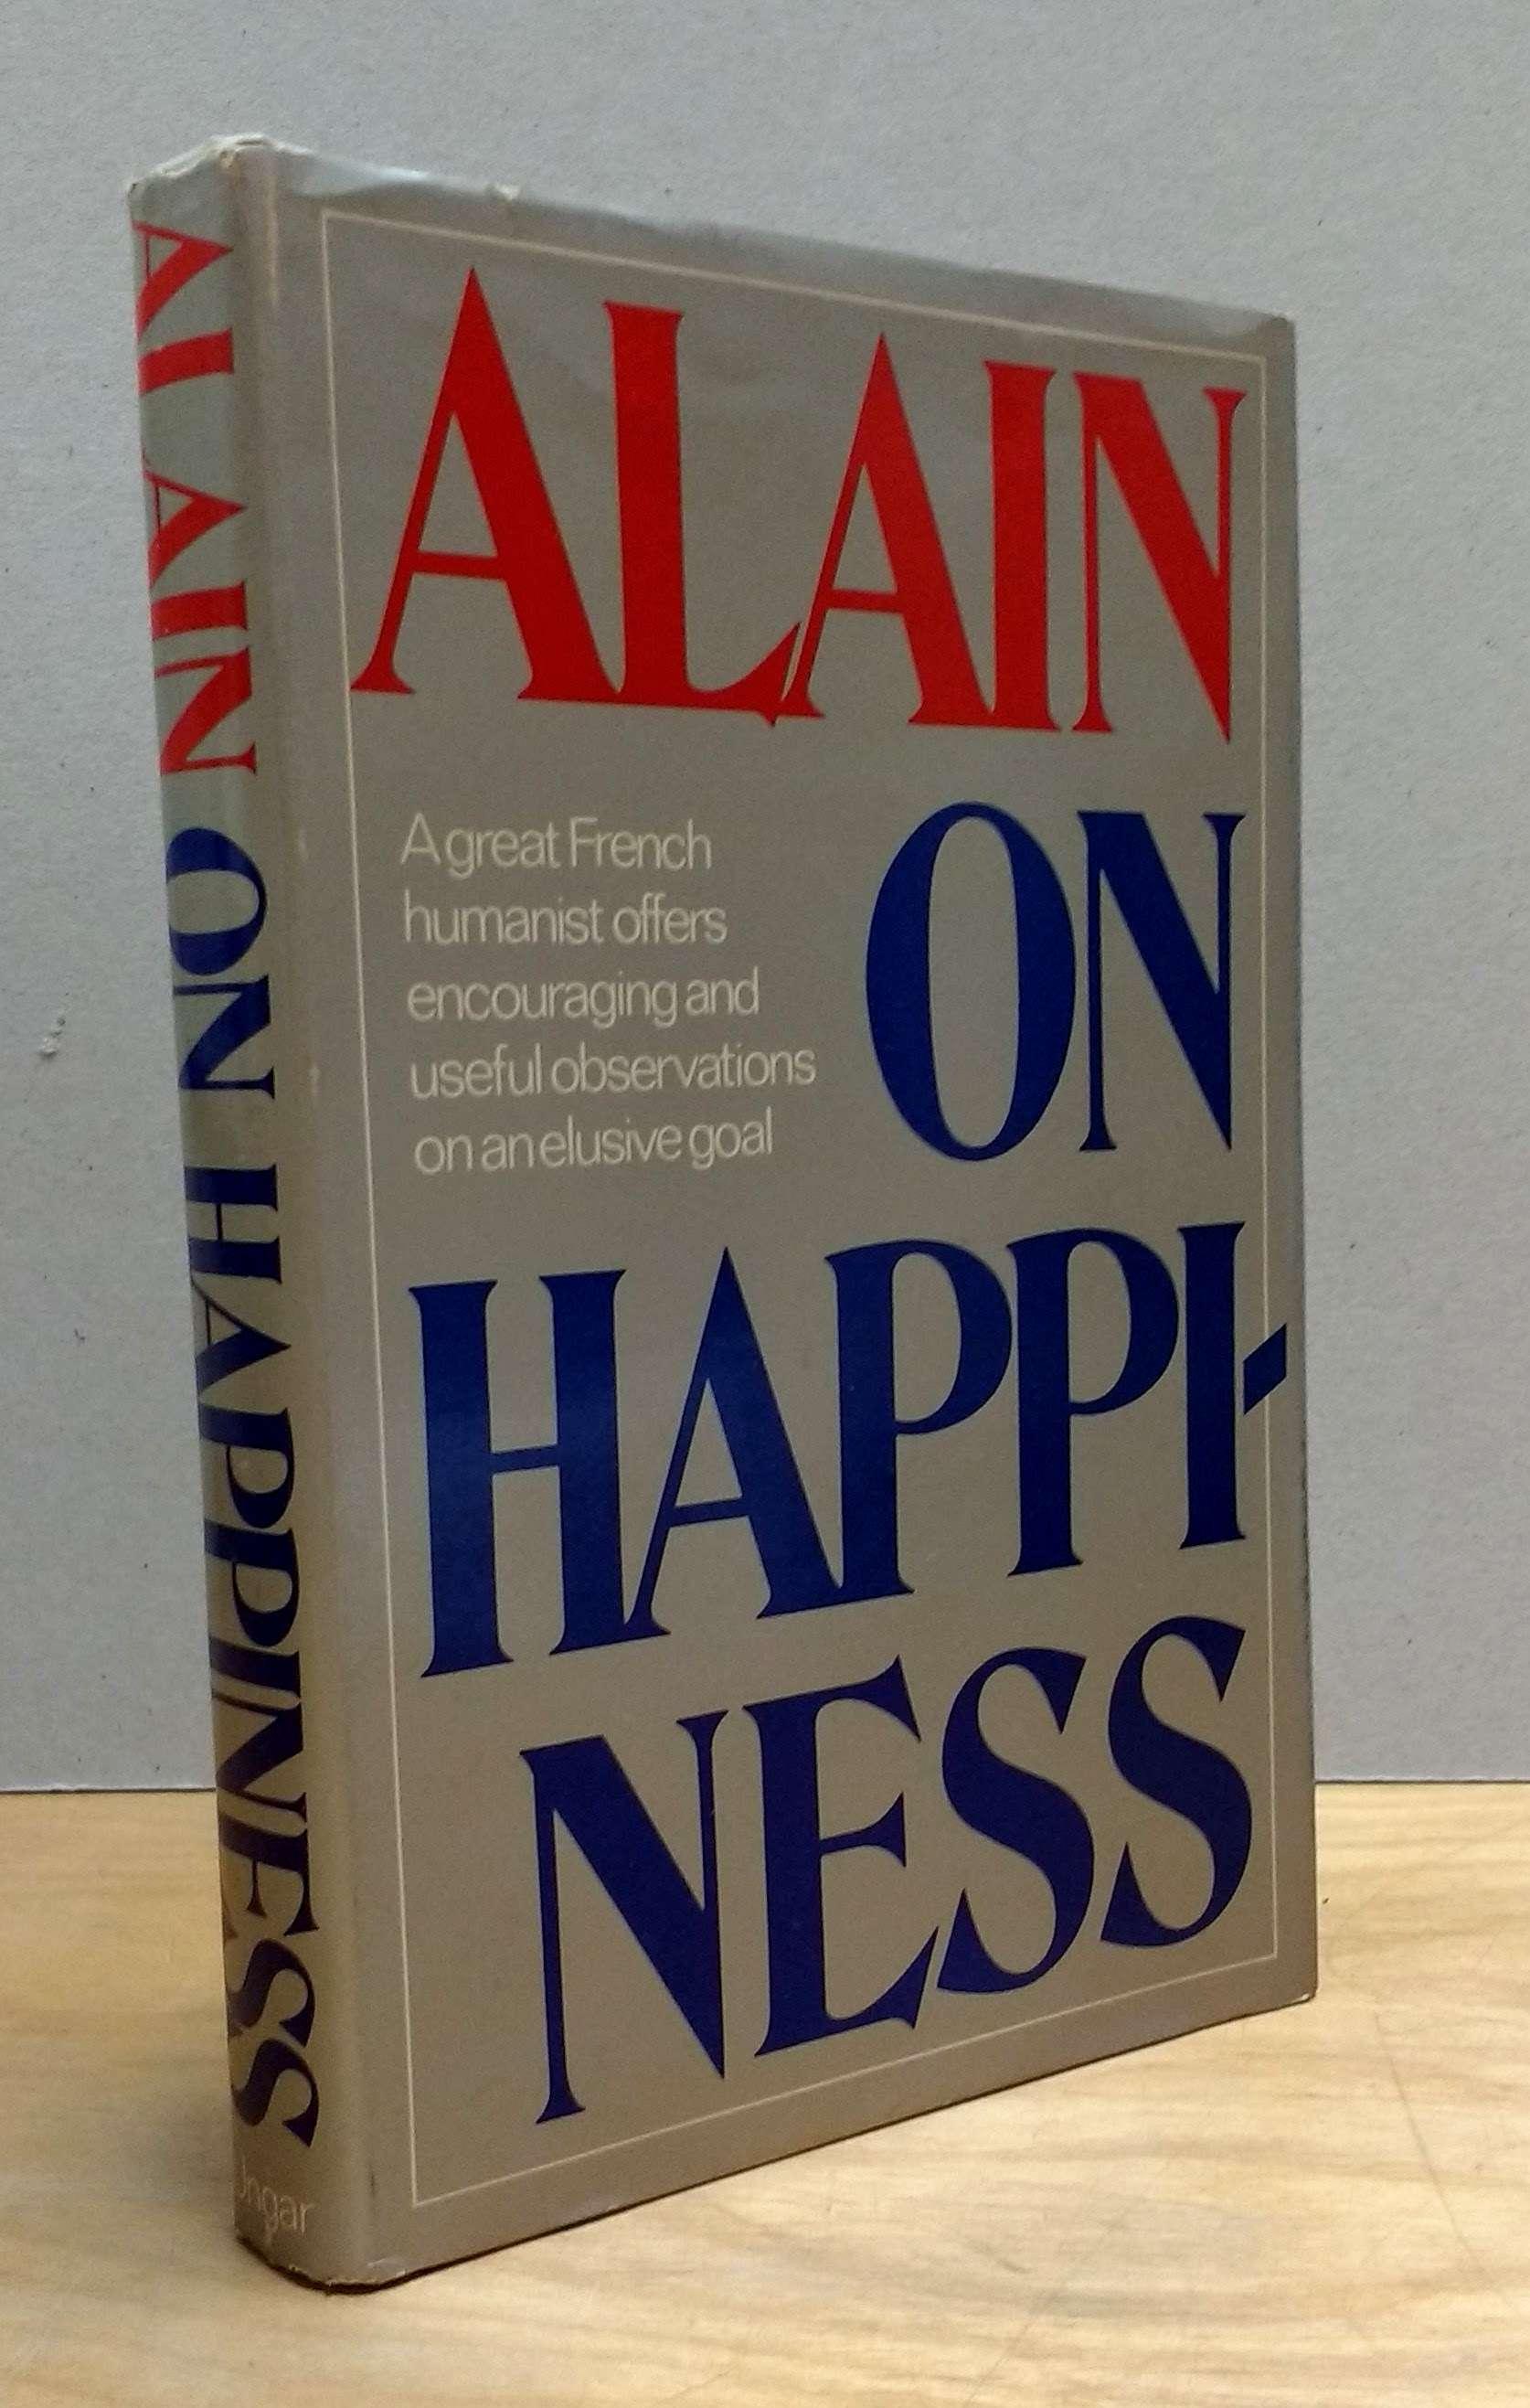 Alain on happiness, Alain